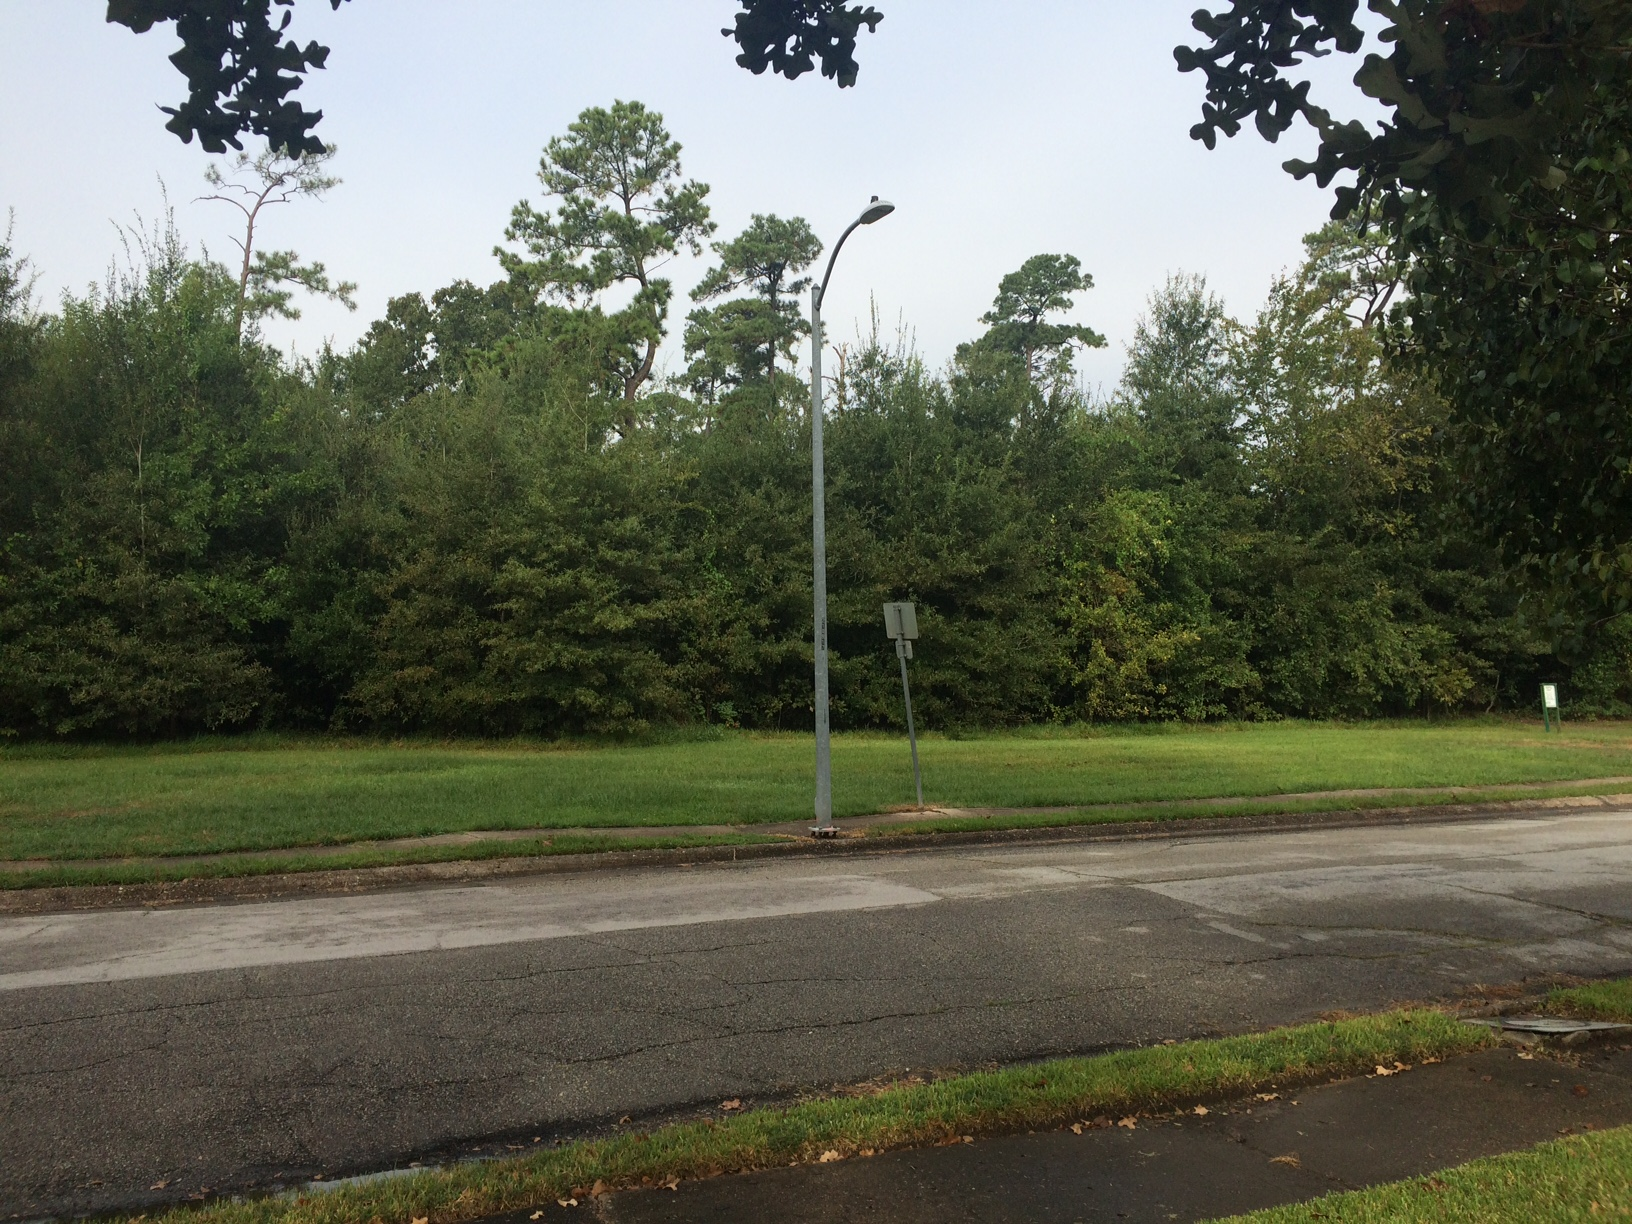 park-trees-20161015-b.jpg